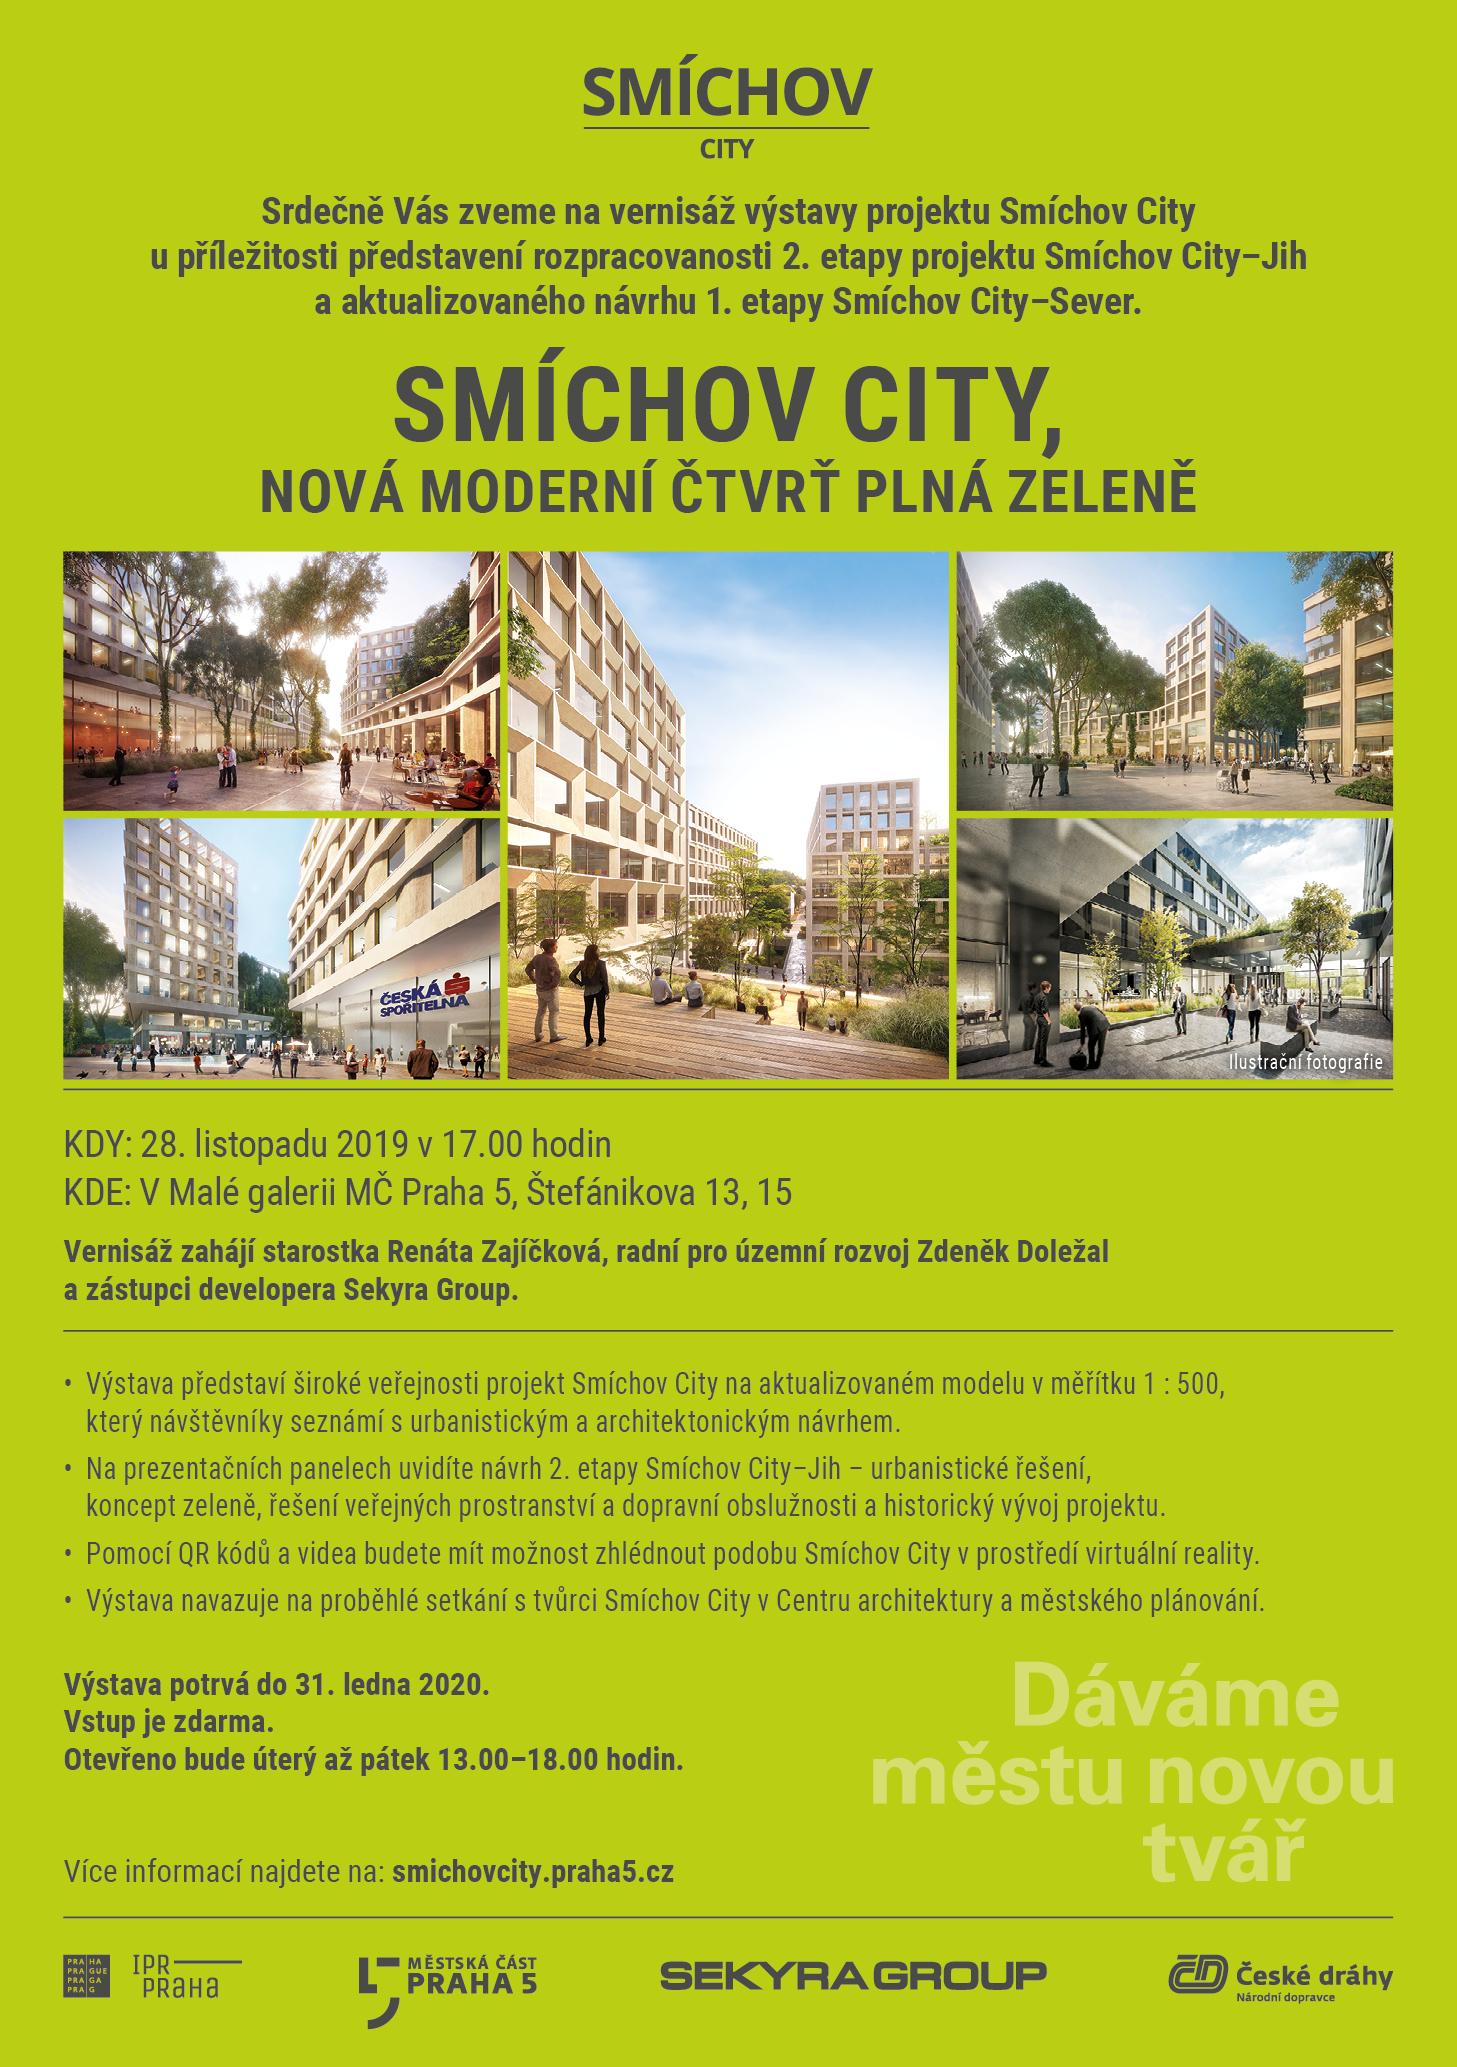 prijdte-na-vernisaz-vystavy-smichov-city-nova-moderni-ctvrt-plna-zelene